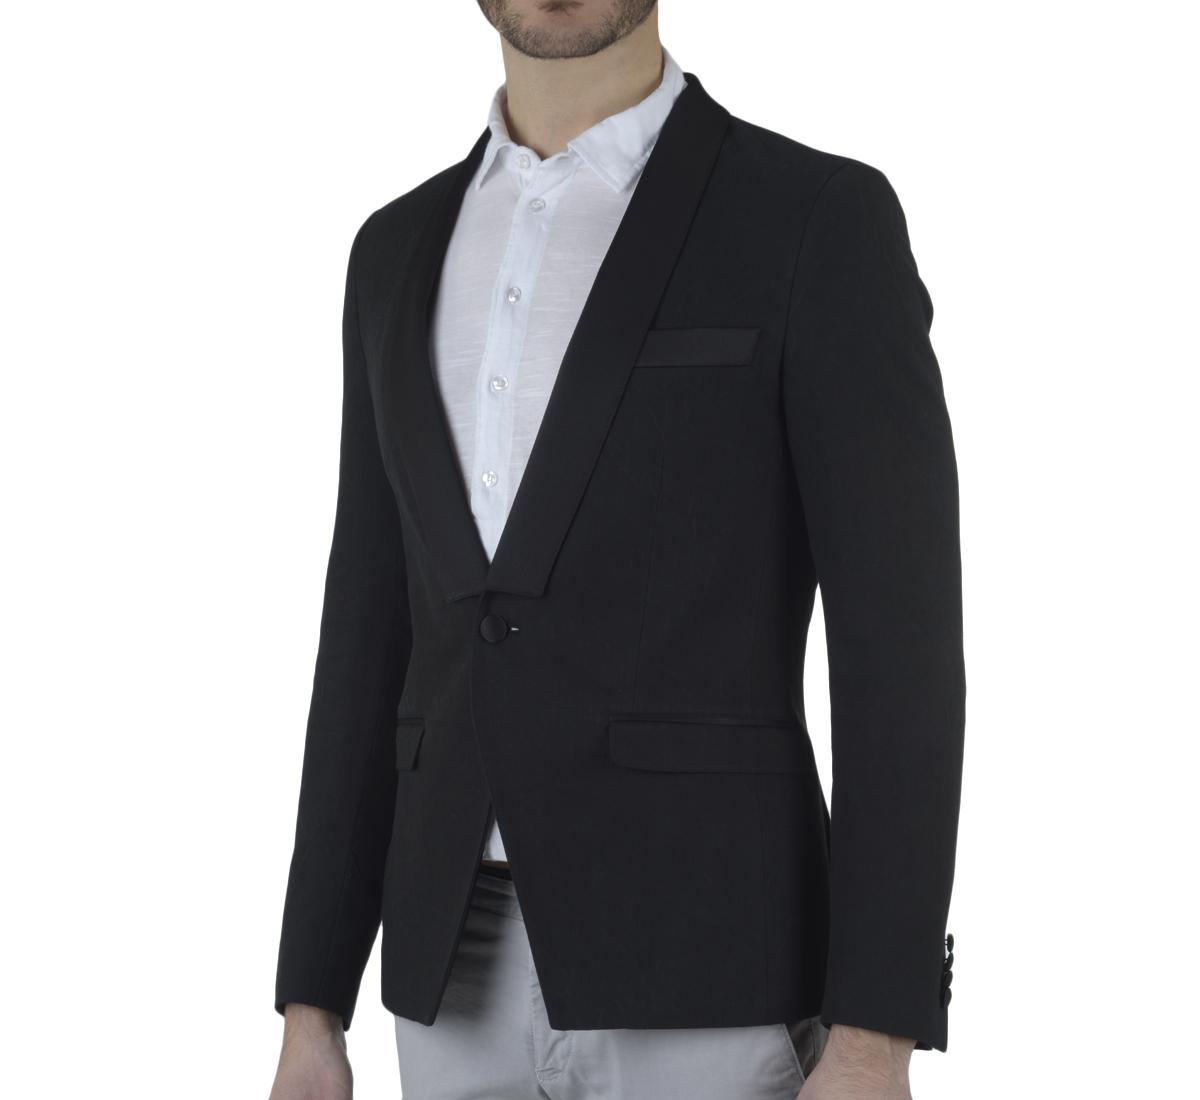 Giacca Matrimonio Uomo : Giusta lunghezza giacca uomo